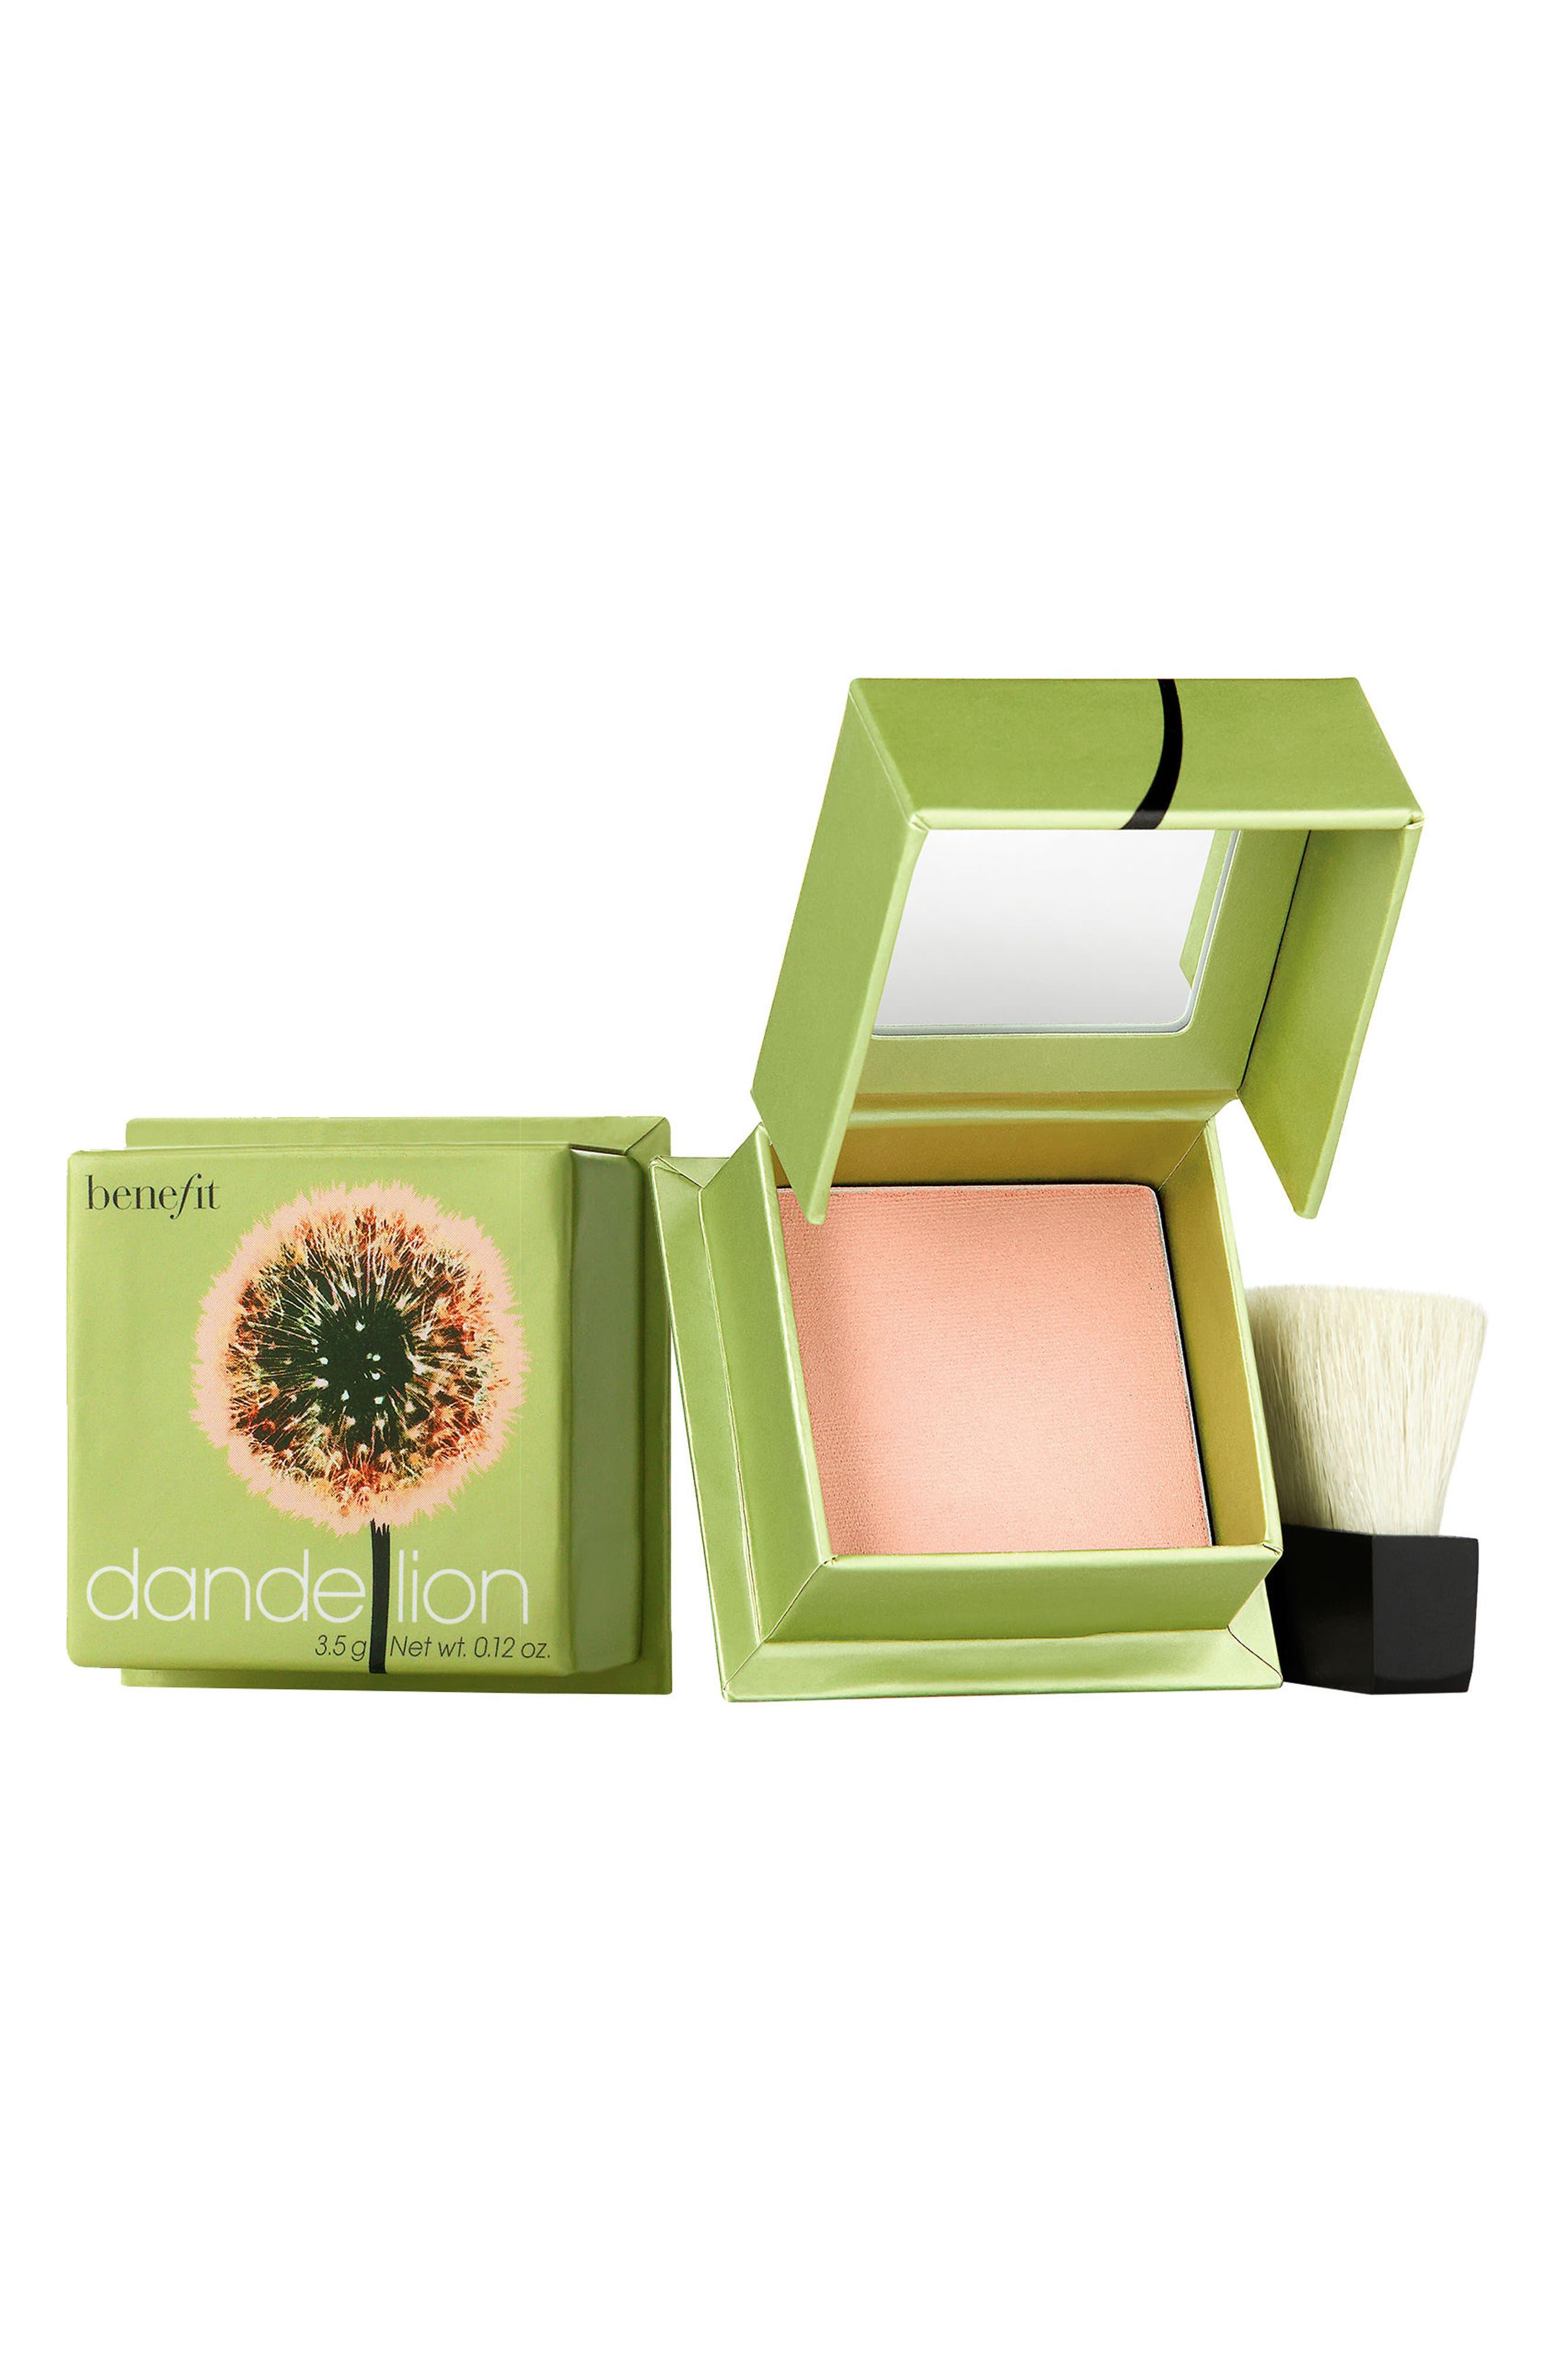 Benefit Dandelion Brightening Powder Blush,                             Main thumbnail 1, color,                             BABY PINK